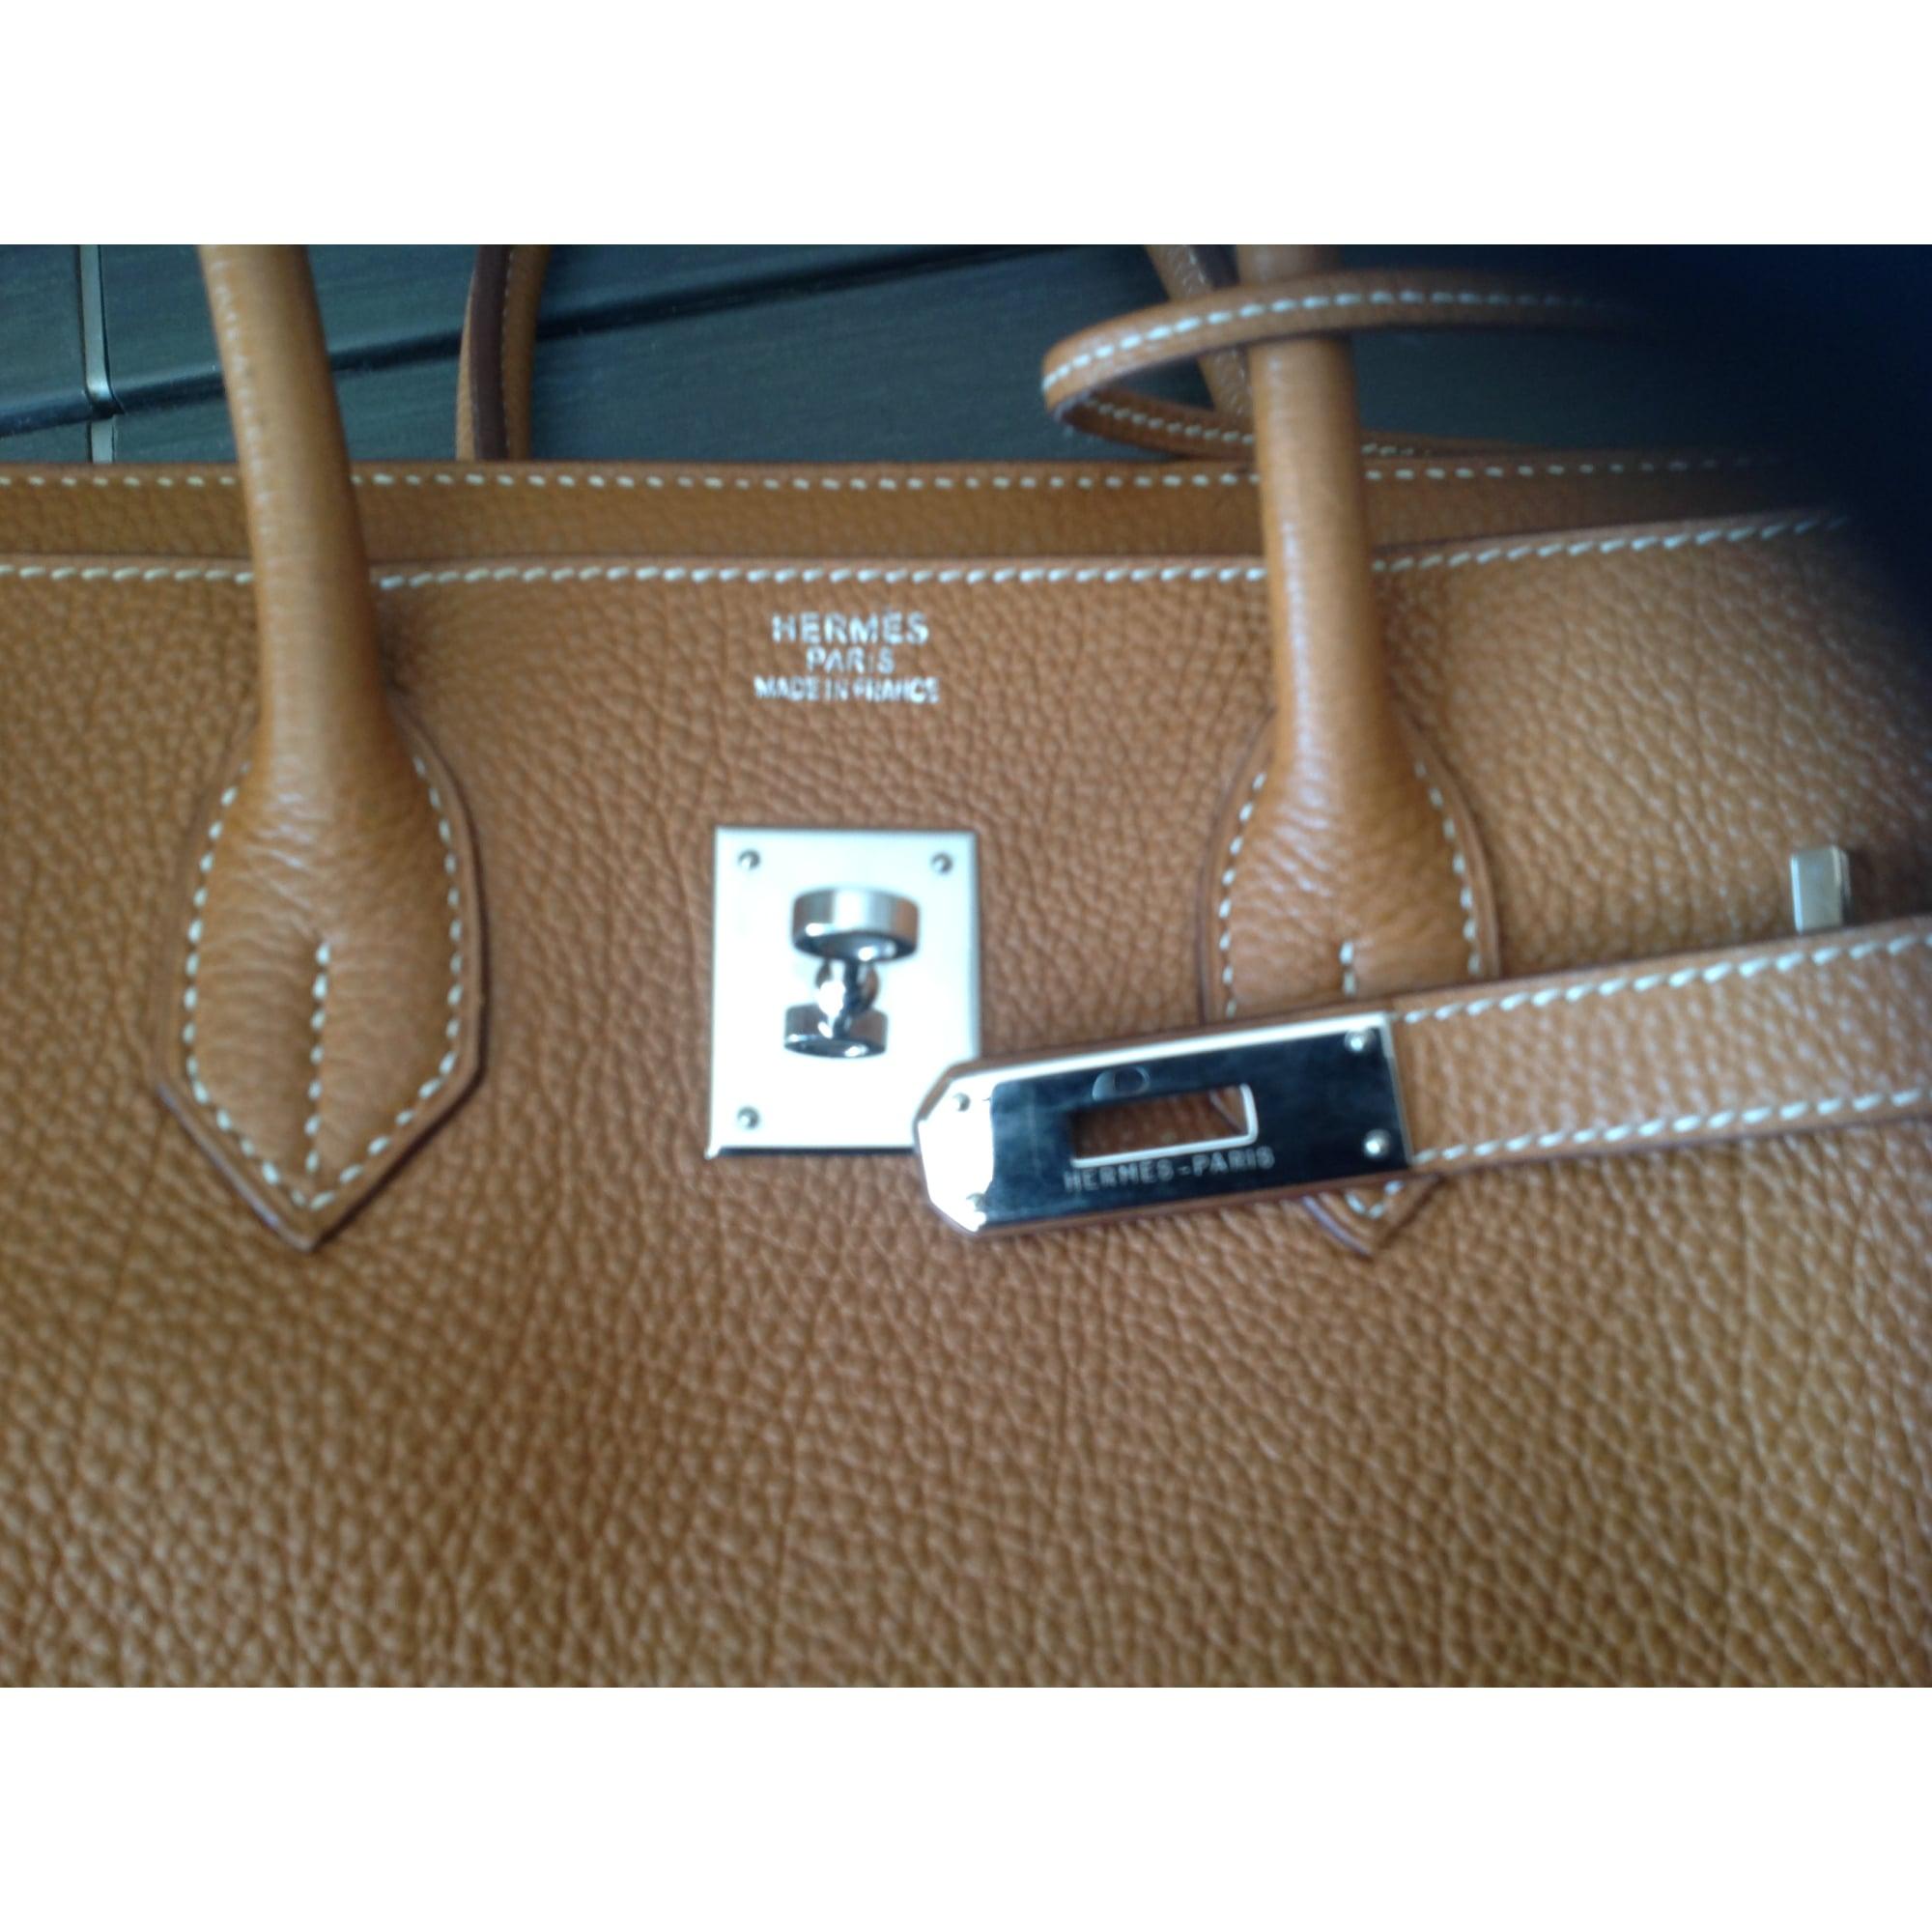 ddff323e94 Sac à main en cuir HERMÈS beige vendu par Shopname279350 ...